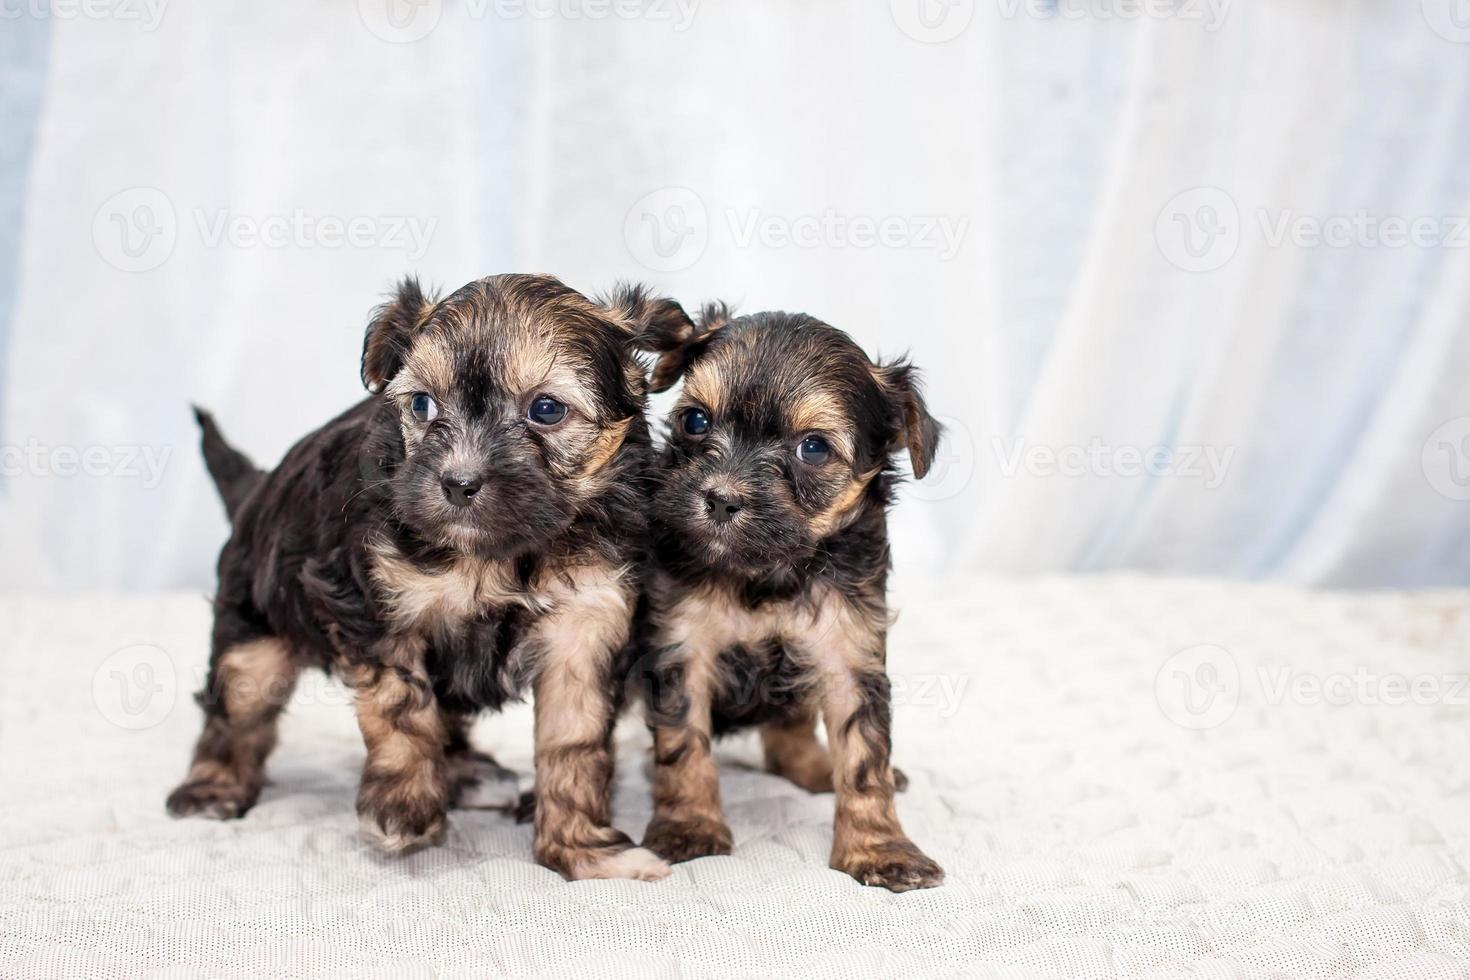 cuccioli cinesi foto